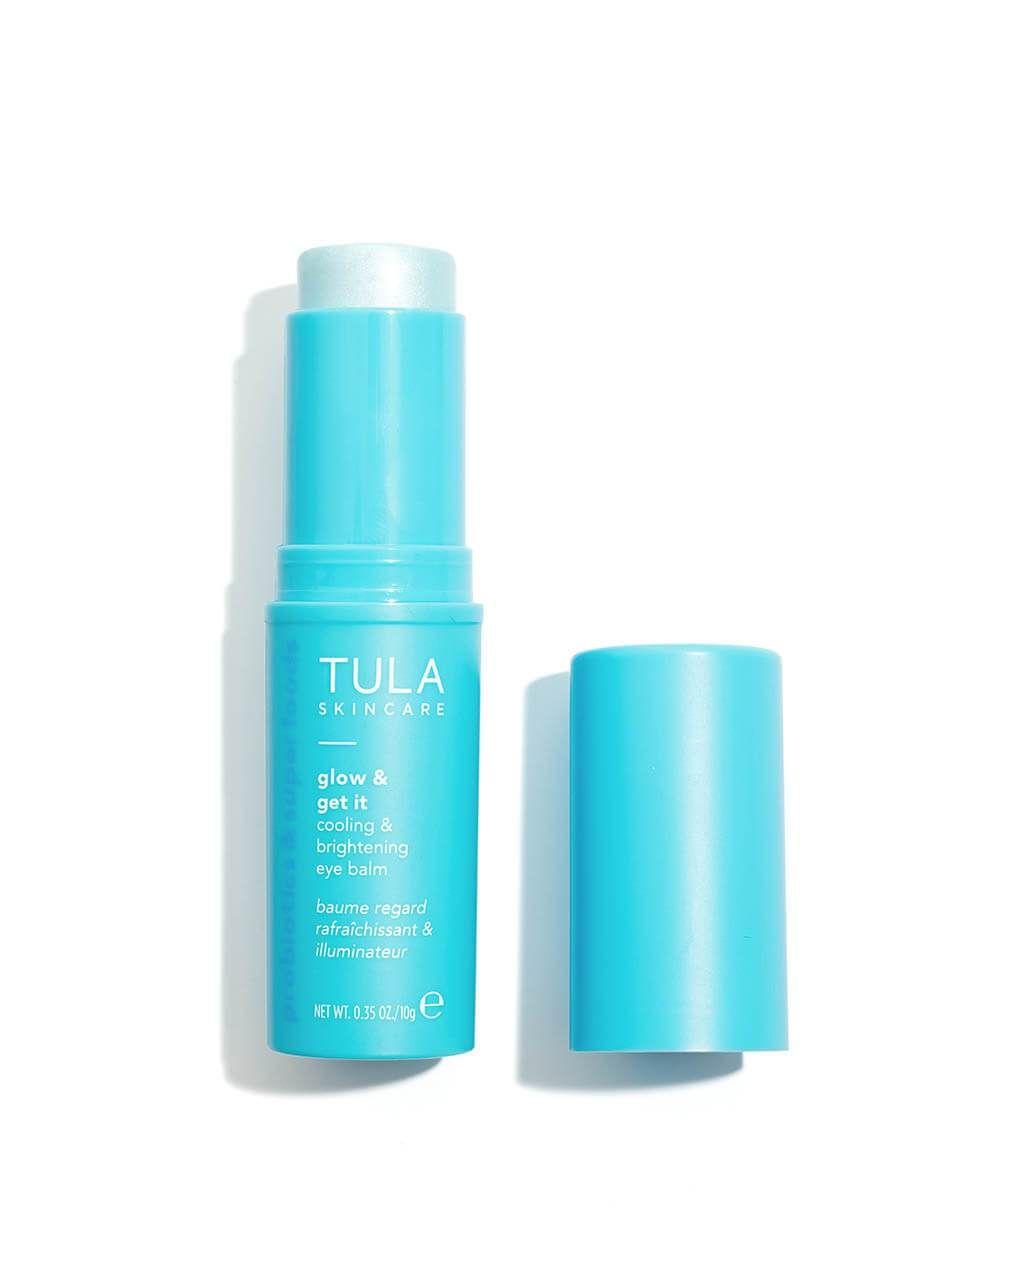 Cooling Brightening Eye Balm The Balm Tula Skincare Glowing